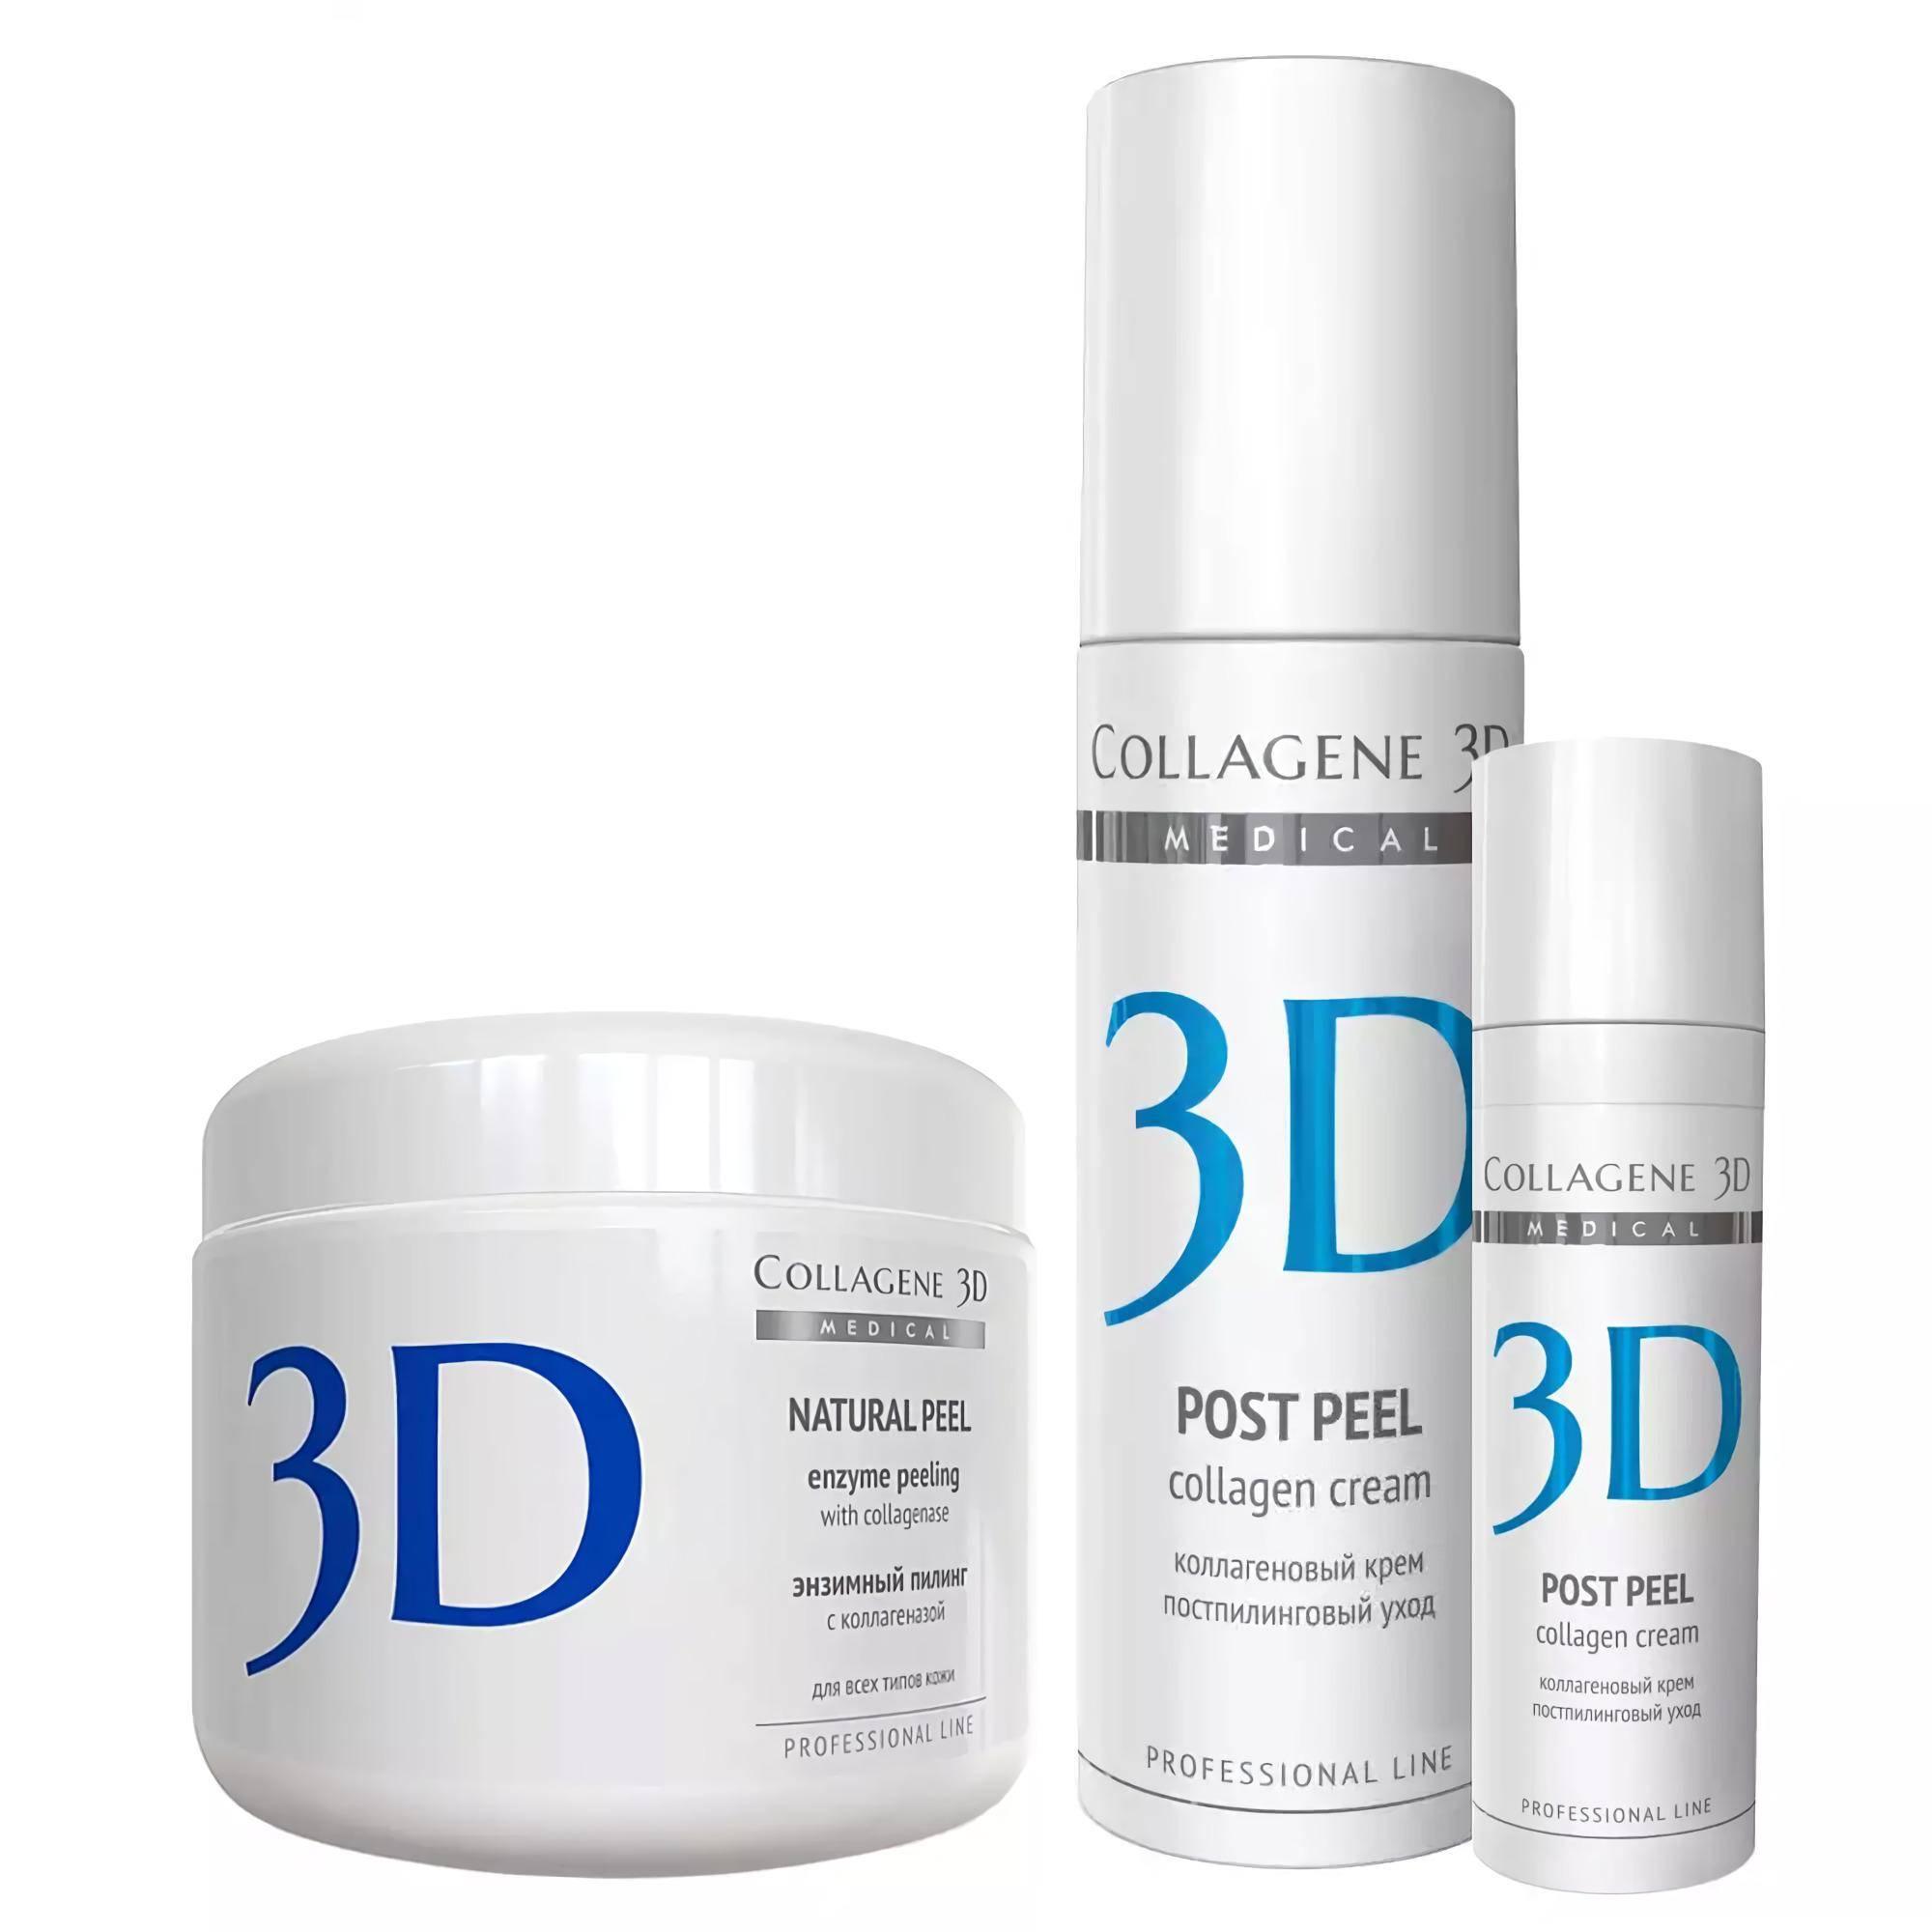 Medical Collagene 3D Professional line 3D Natural peel